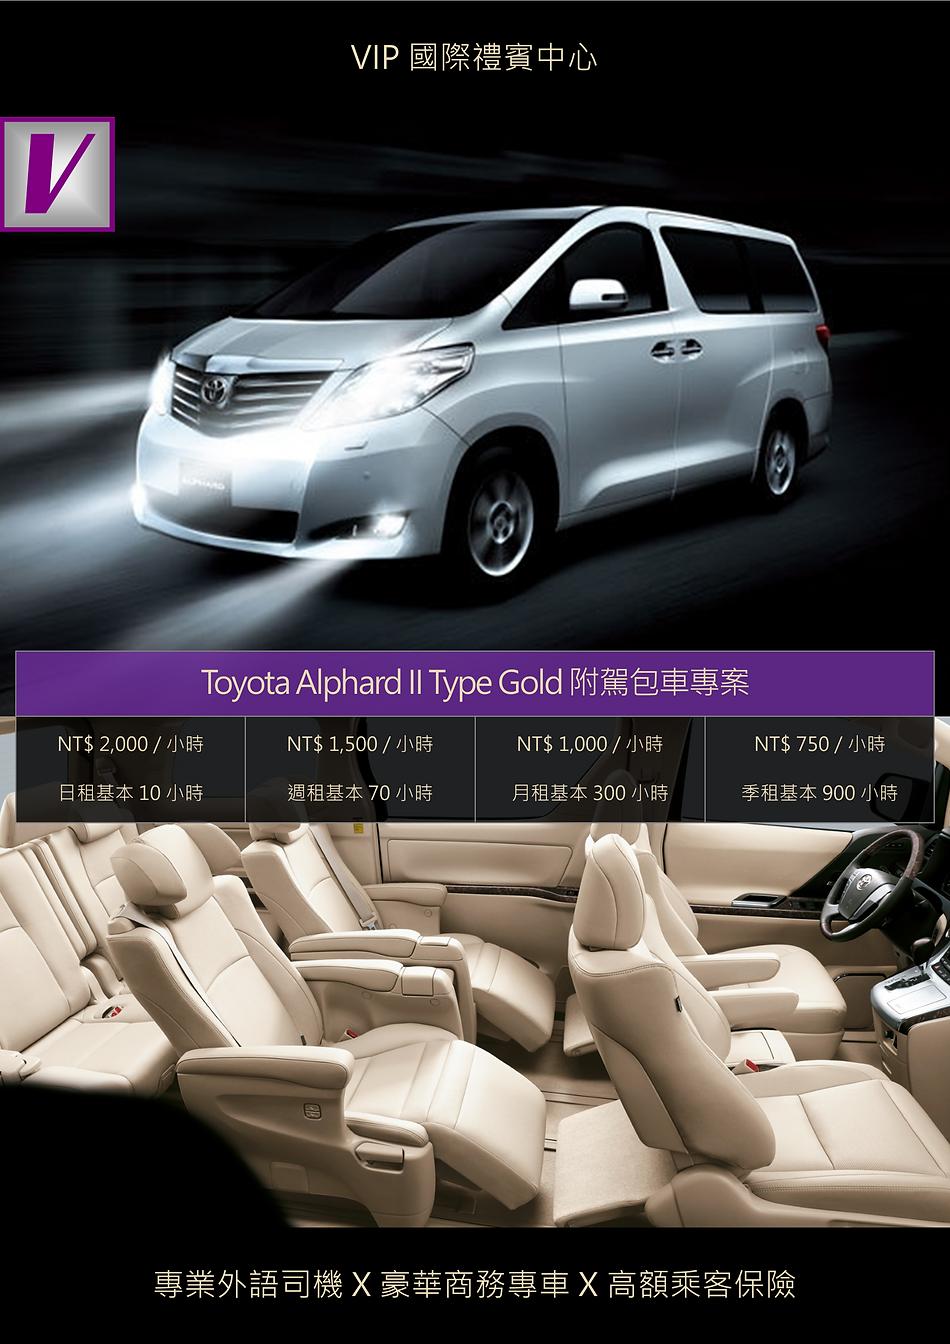 VIP國際禮賓中心 TOYOTA ALPHARD II TYPE GOLD 附駕包車專案 DM.png